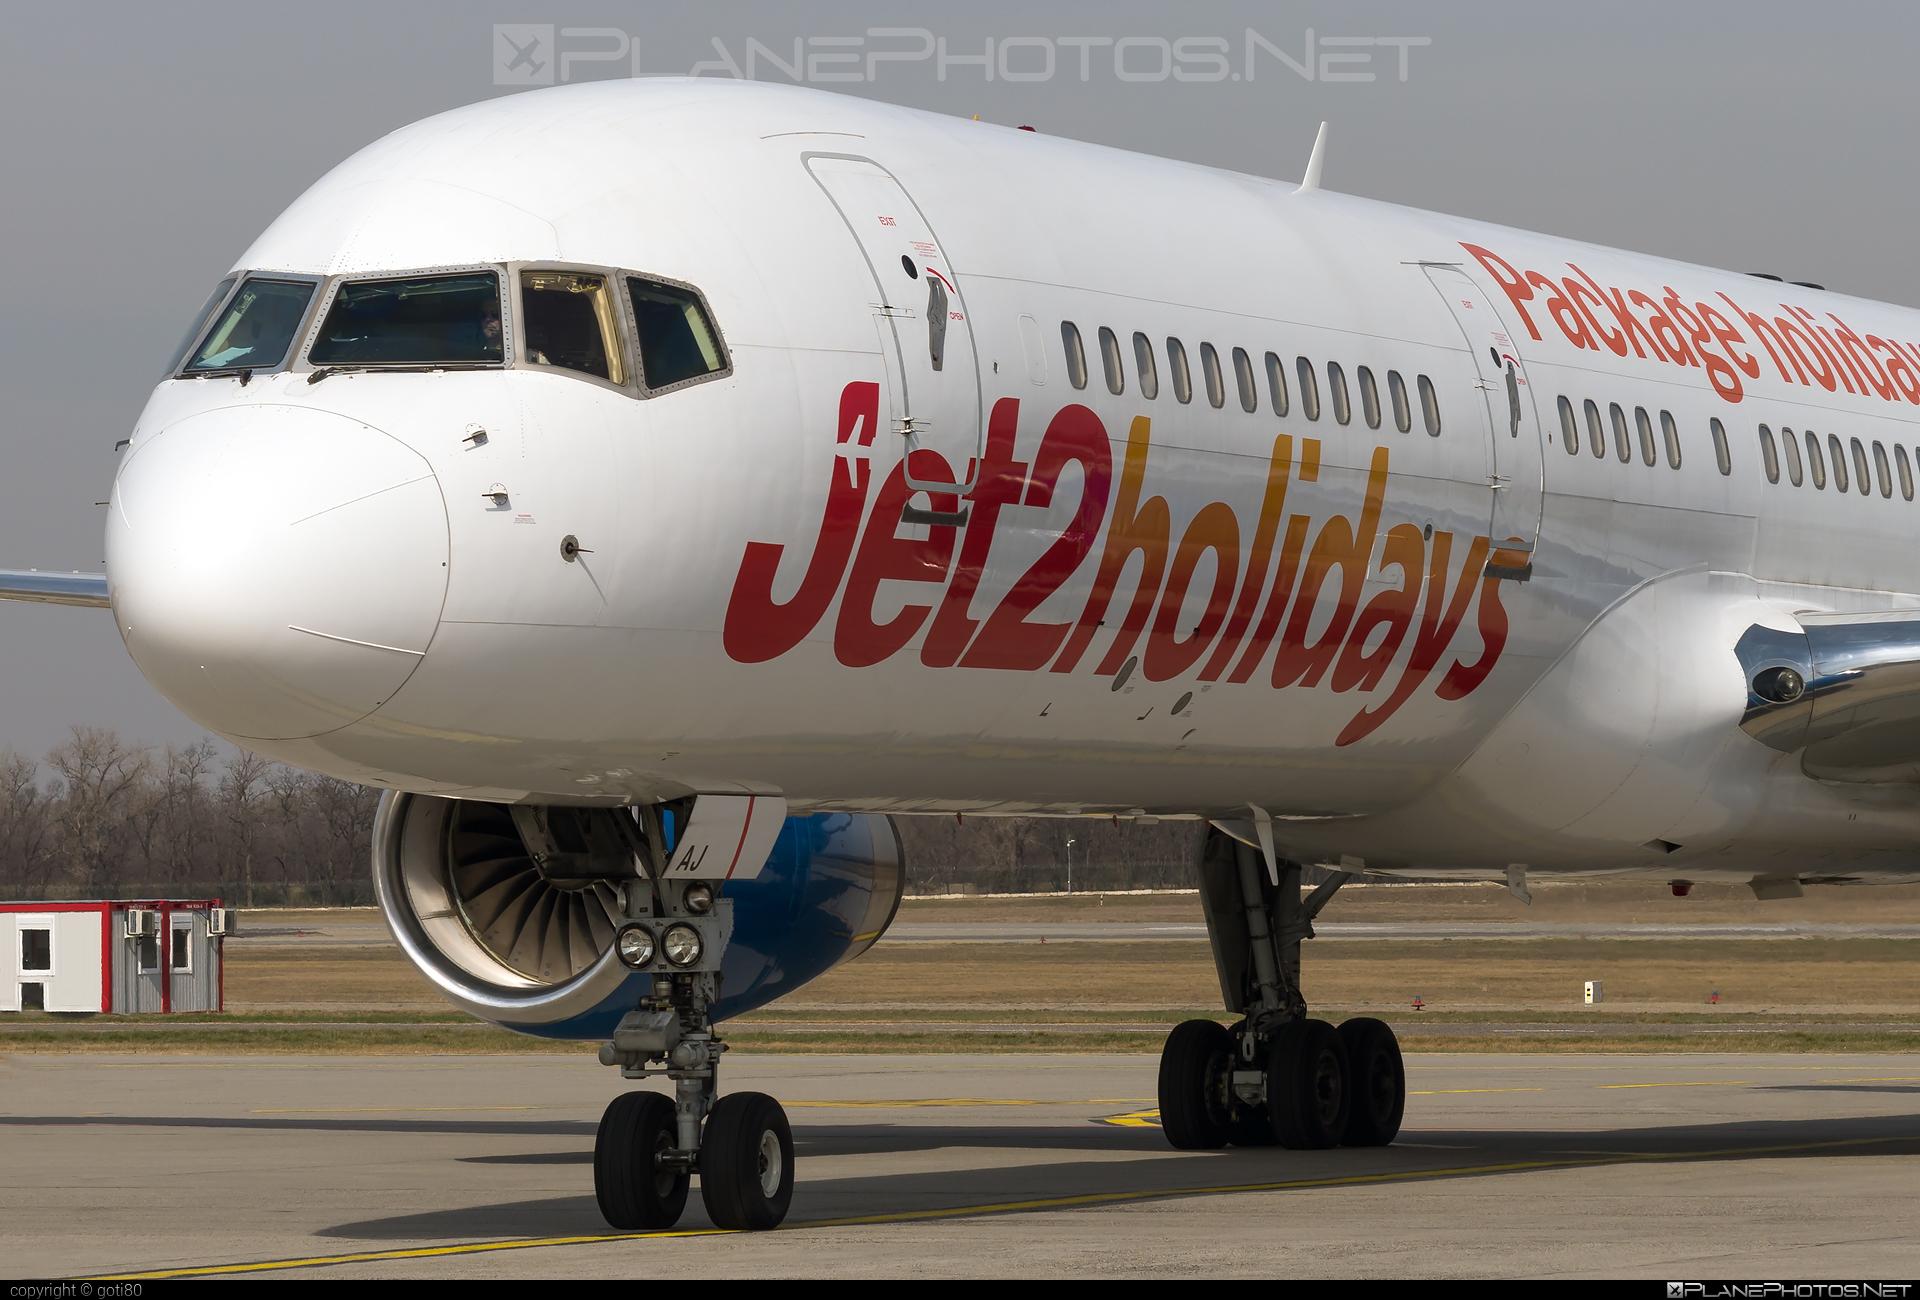 Boeing 757-200 - G-LSAJ operated by Jet2 #b757 #boeing #boeing757 #jet2